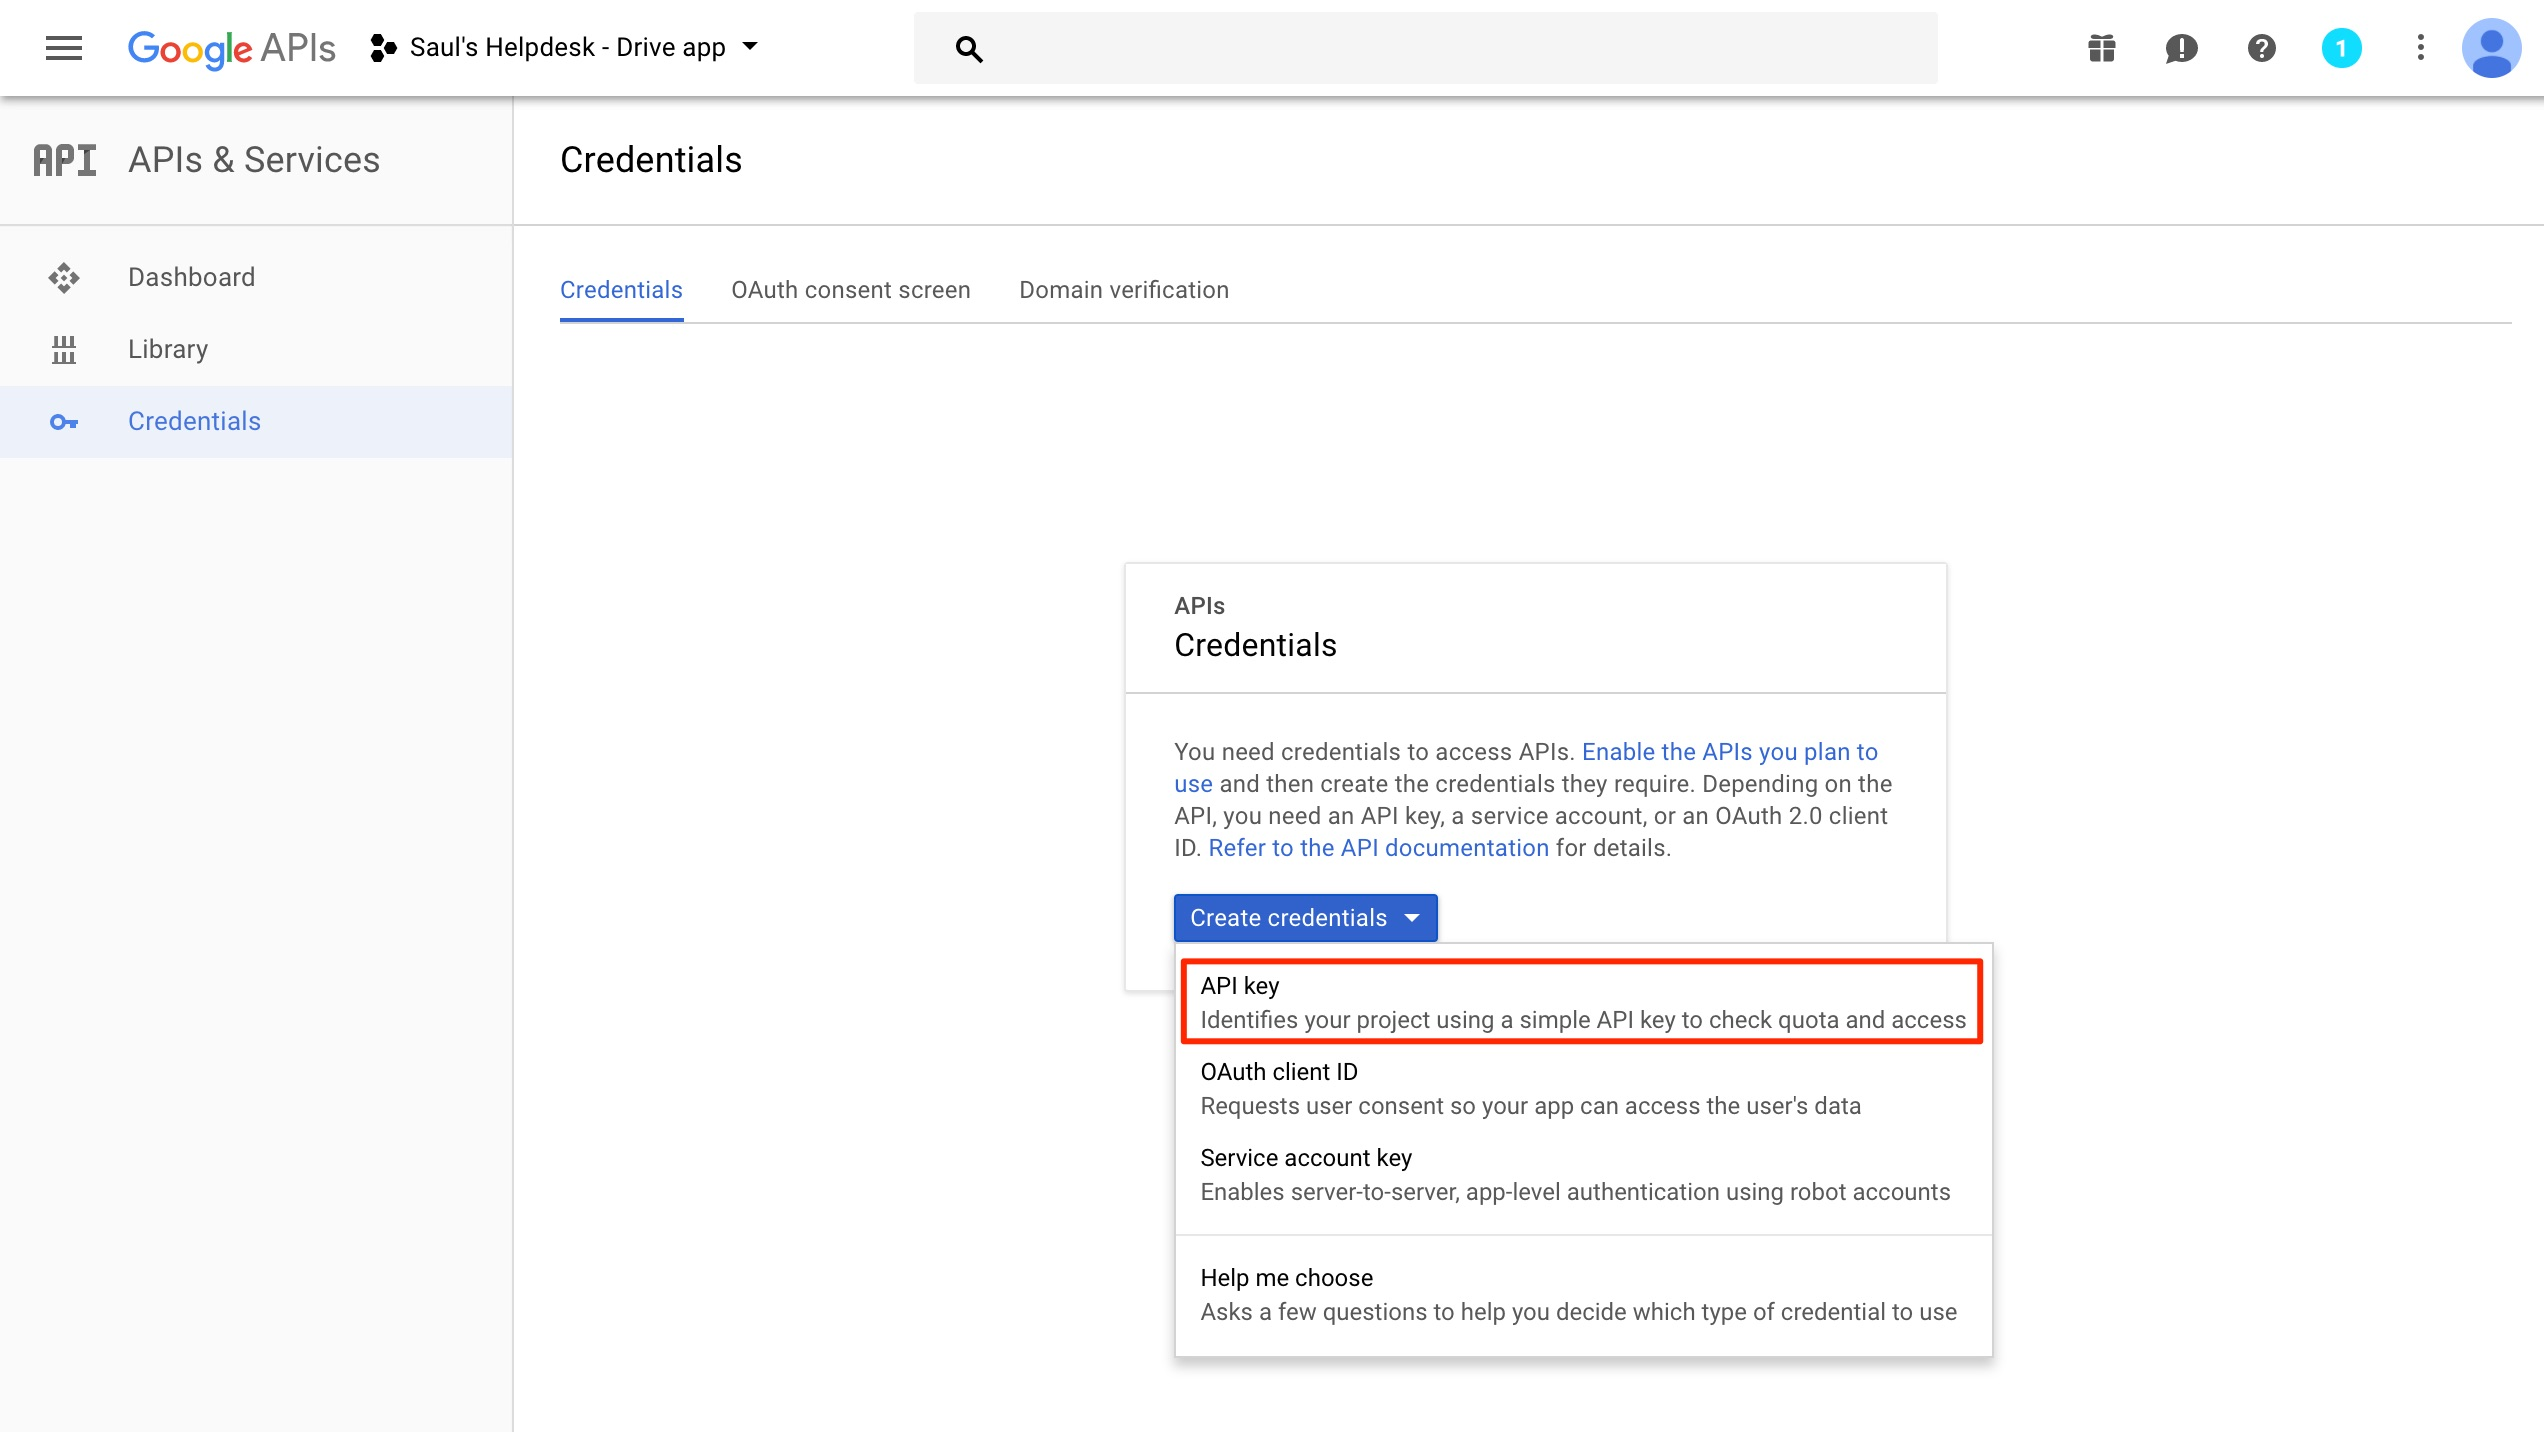 The Google Drive app : Freshdesk